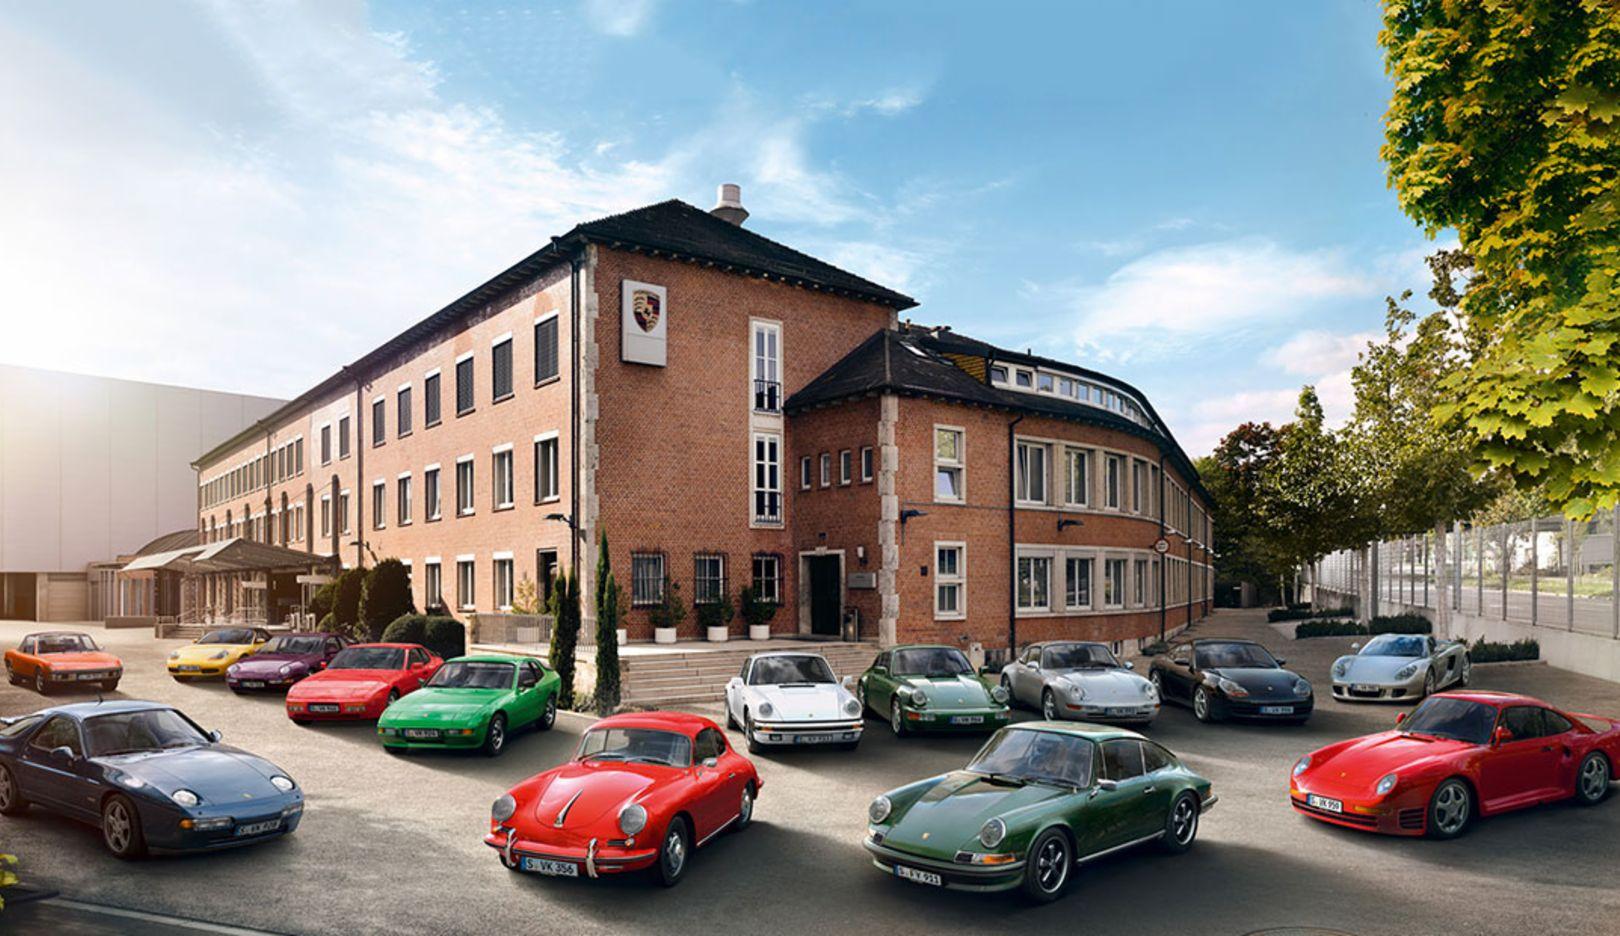 Porsche Classic model range, 2017, Porsche AG